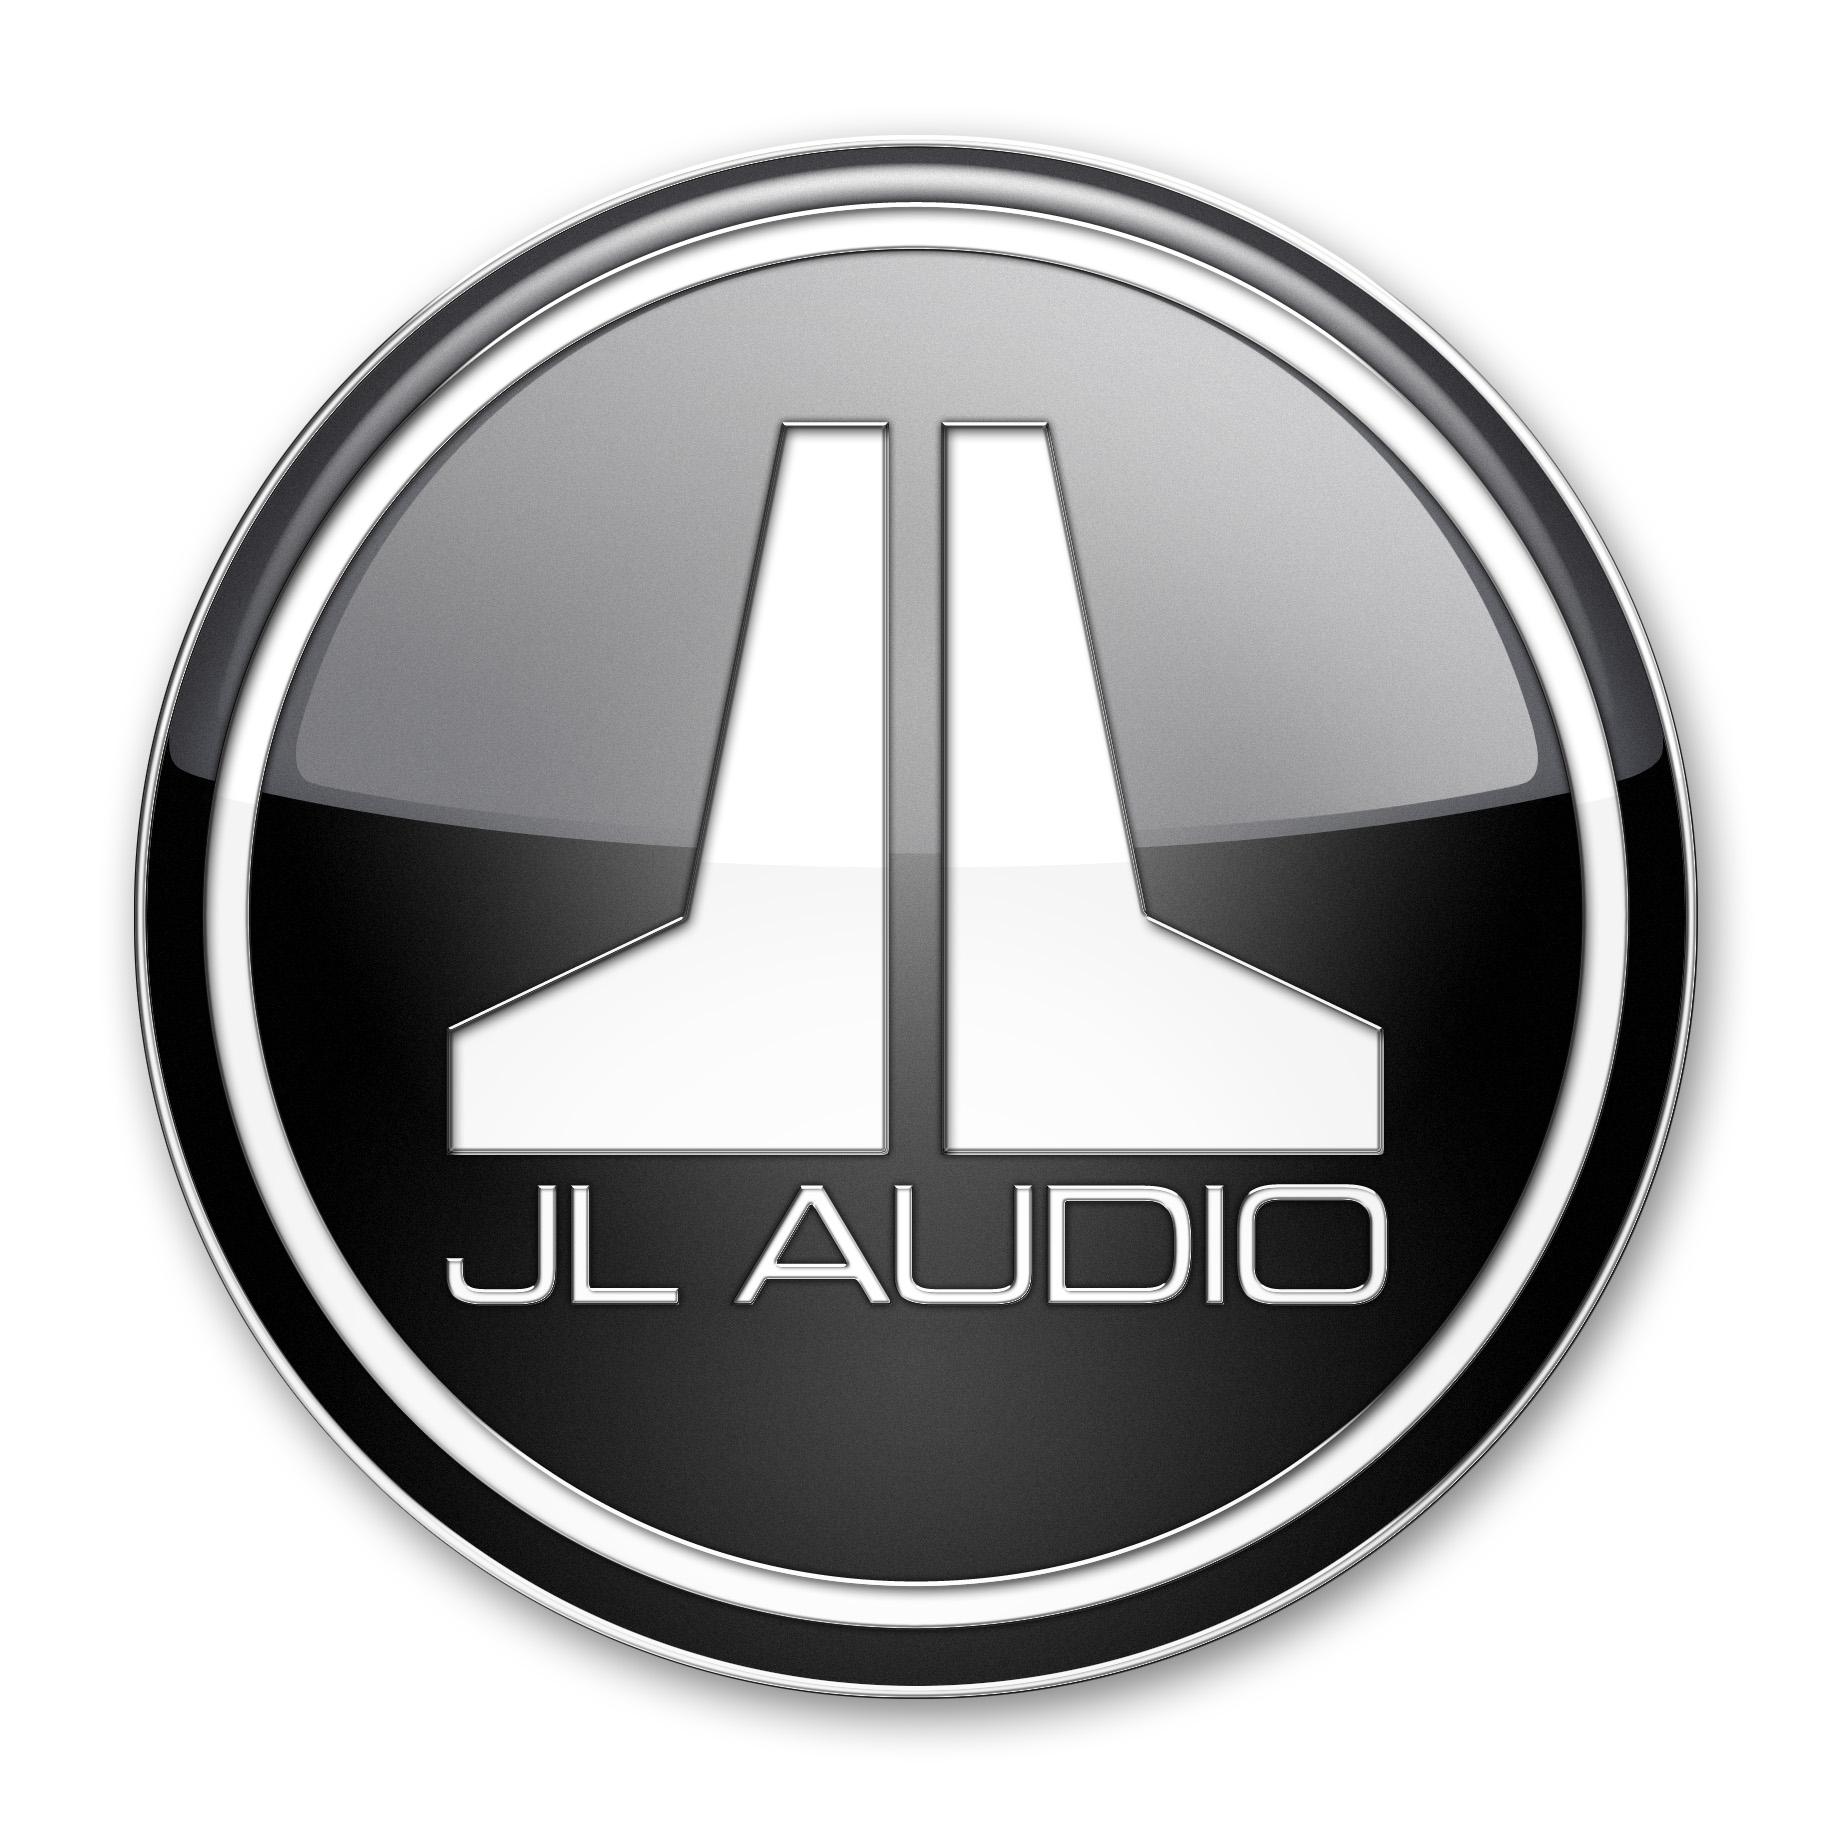 jl audio logo wallpapers - photo #5